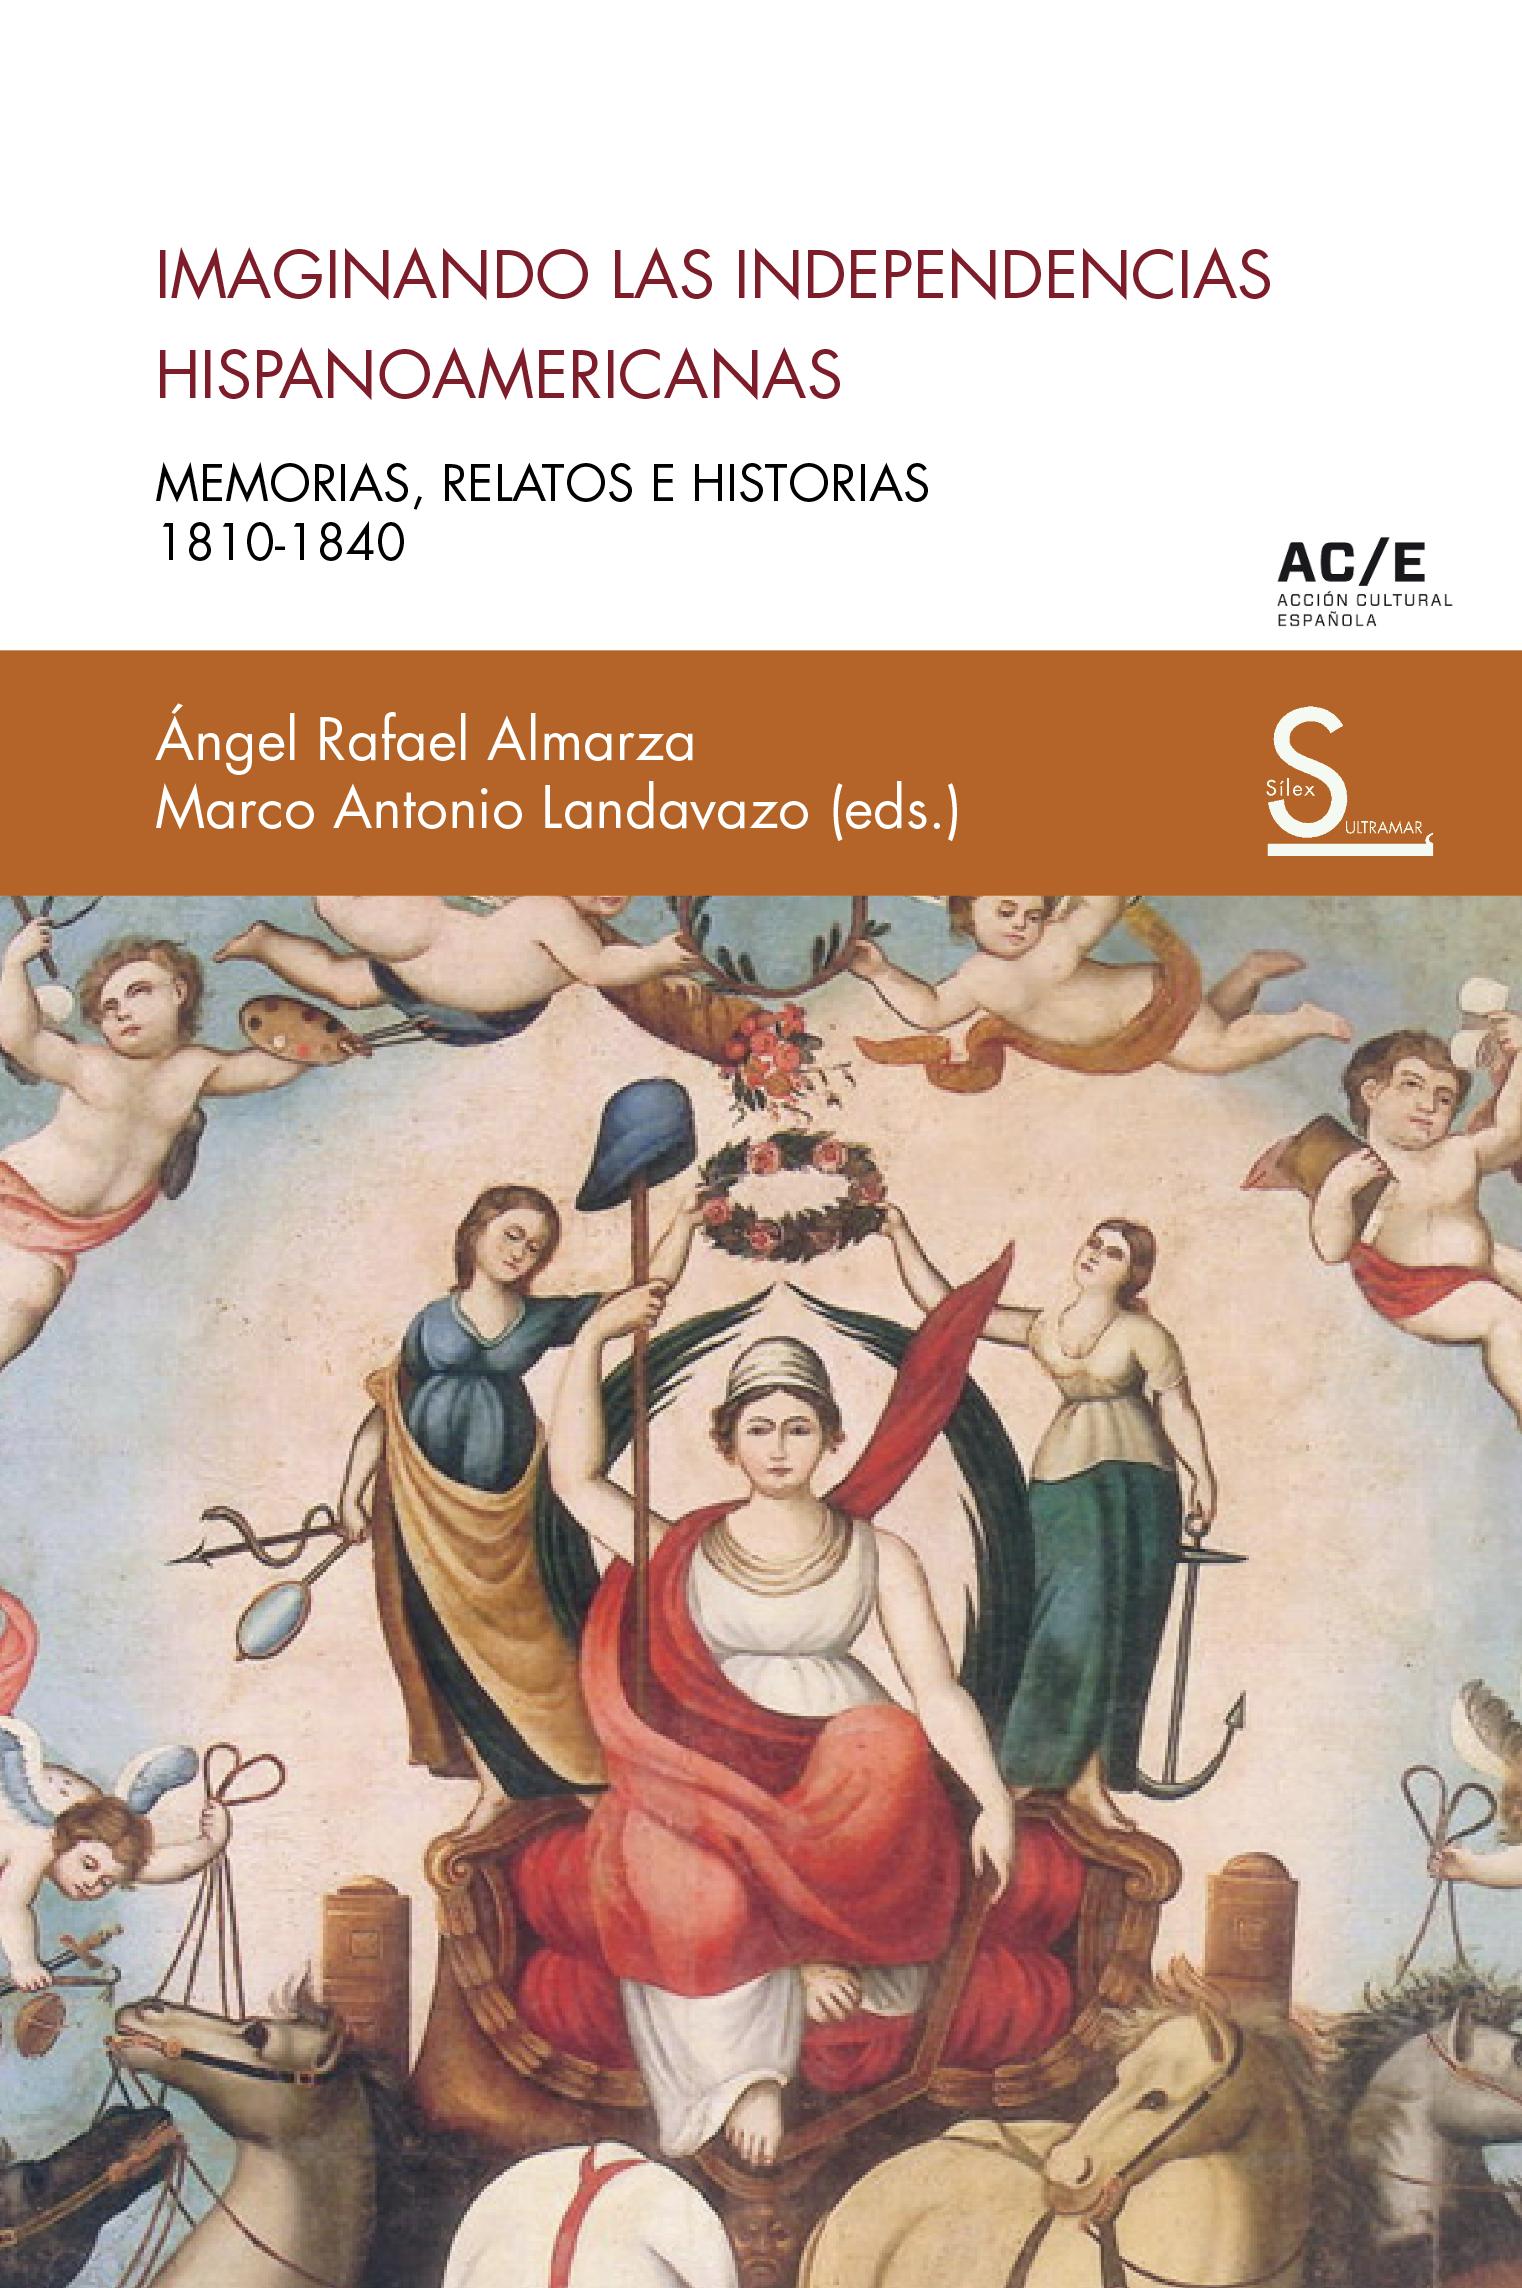 Imaginando las independencias hispanoamericanas   «Memorias, relatos e historias 1810-1840»